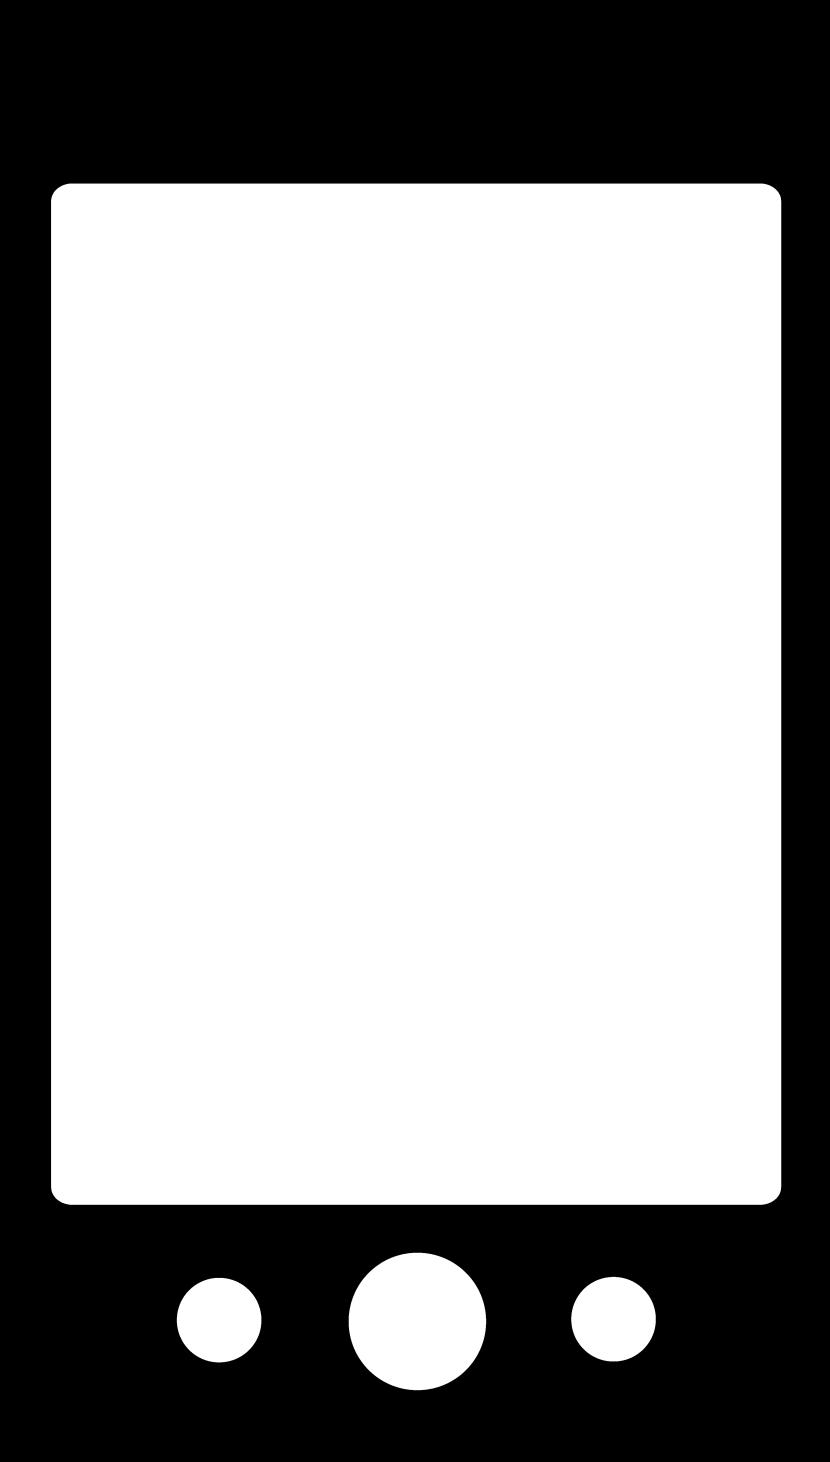 Free Phone Cliparts, Download Free Clip Art, Free Clip Art.